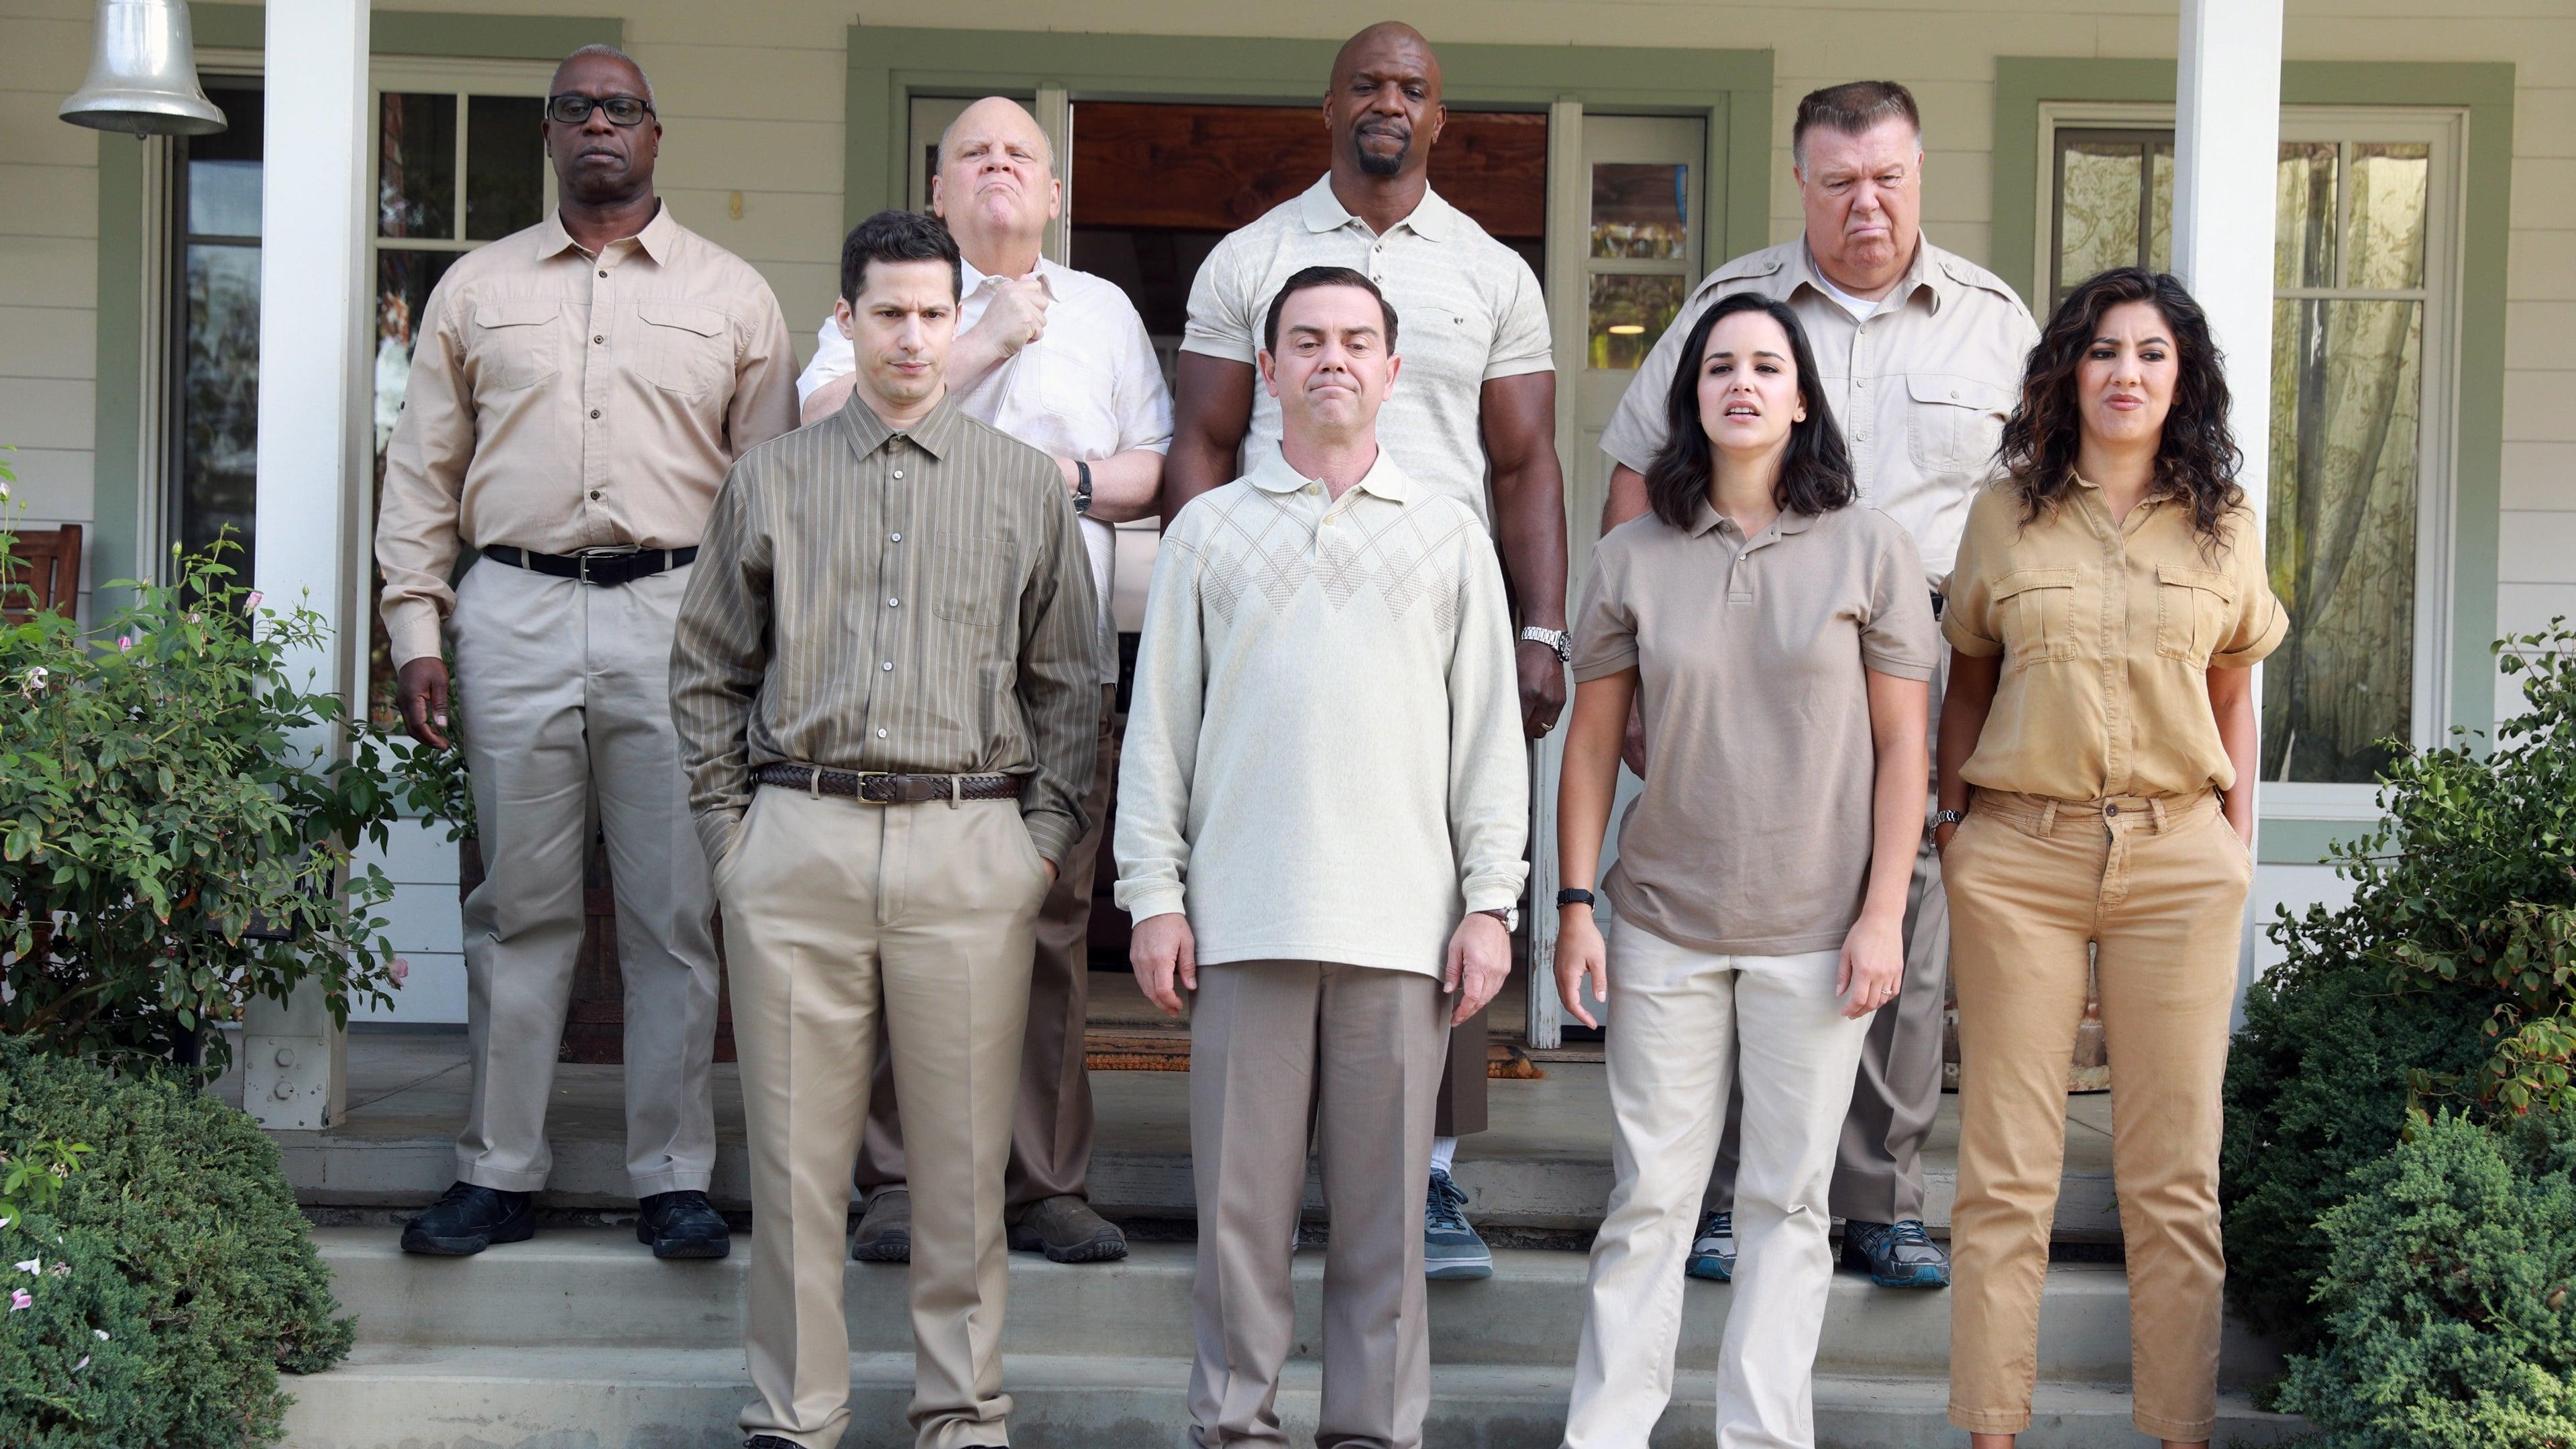 Brooklyn Nine-Nine - Season 5 Episode 9 : 99